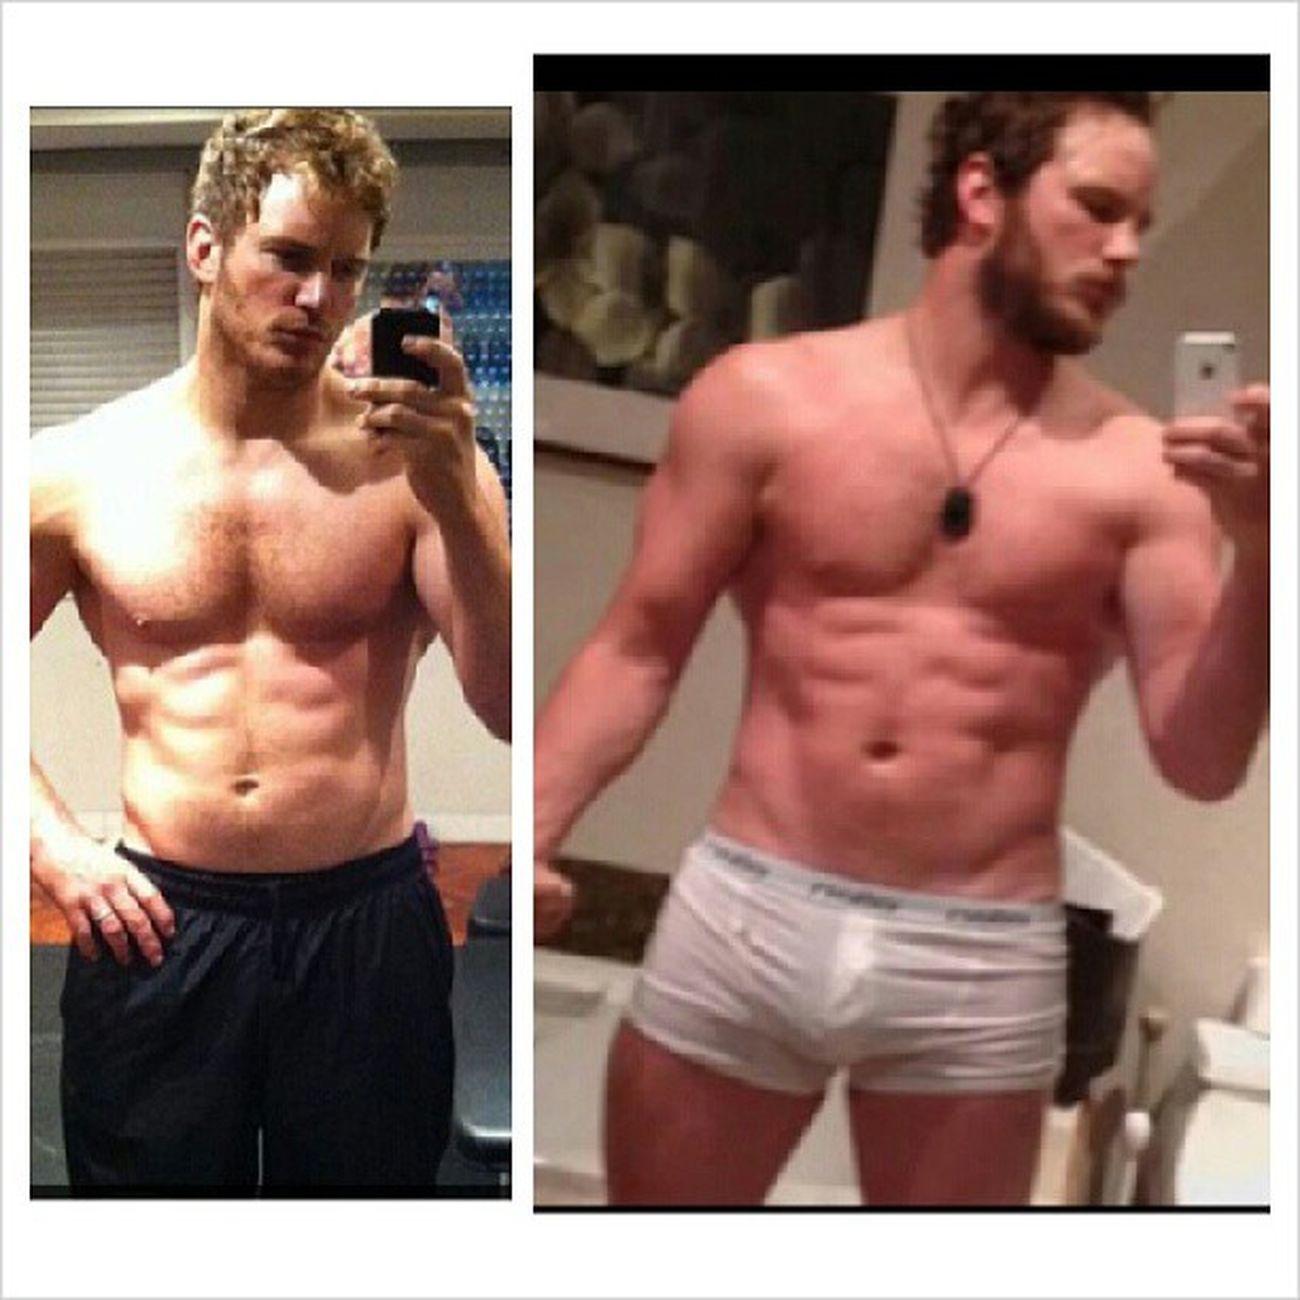 Let's take a moment to bask in the glory of Chris Pratt's Guardians of the Galaxy/Zero Dark Thirty body. Goddammit Chrispratt